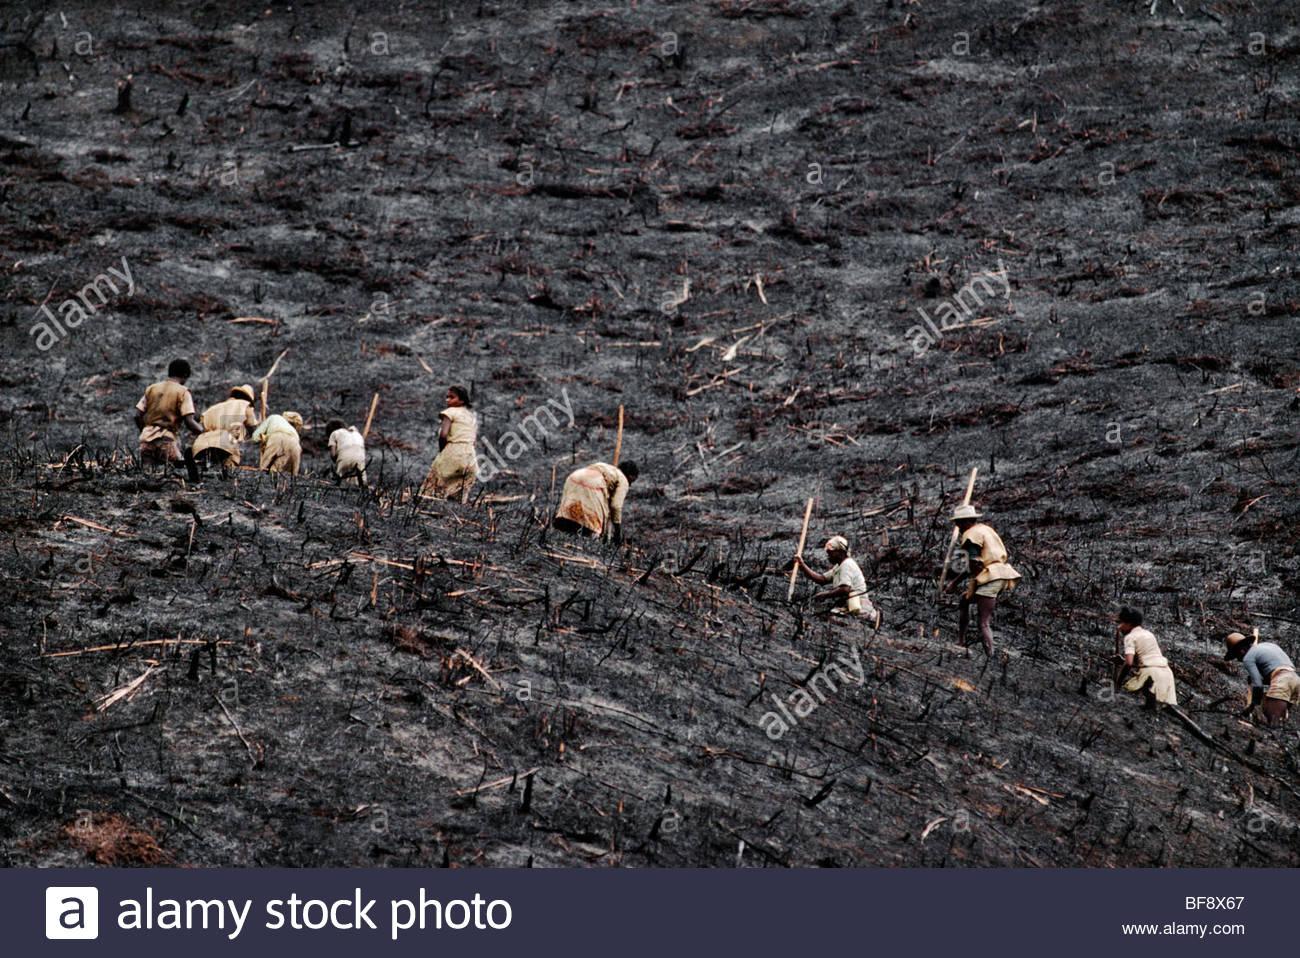 Subsistence farmers planting rice on freshly burned hillside, Eastern rainforest, Madagascar - Stock Image